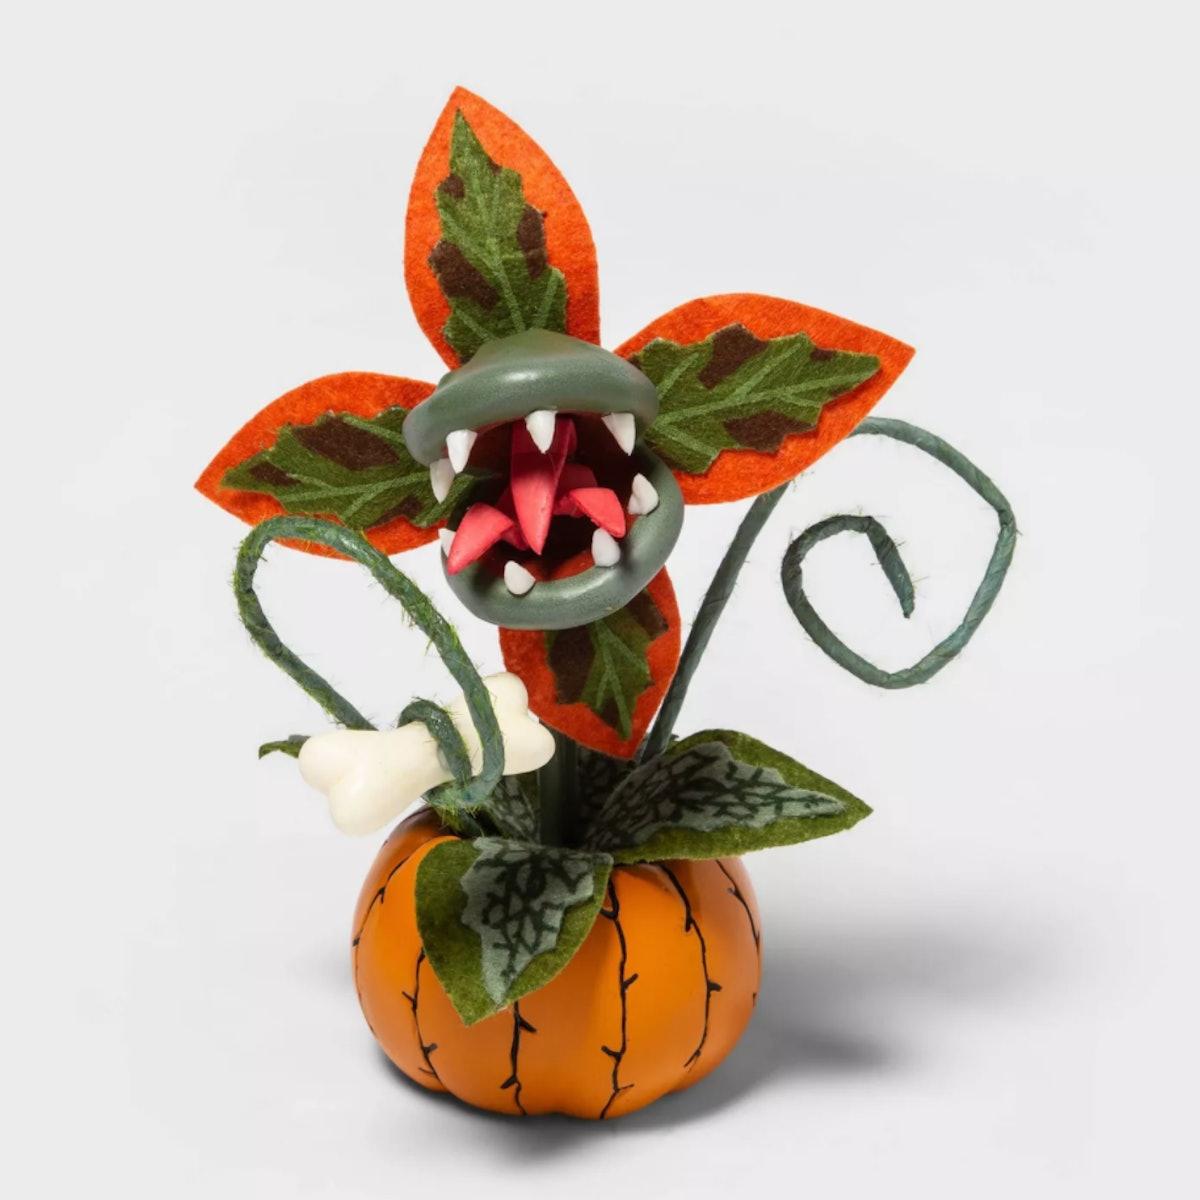 Creepy Decorative Halloween Faux Succulent